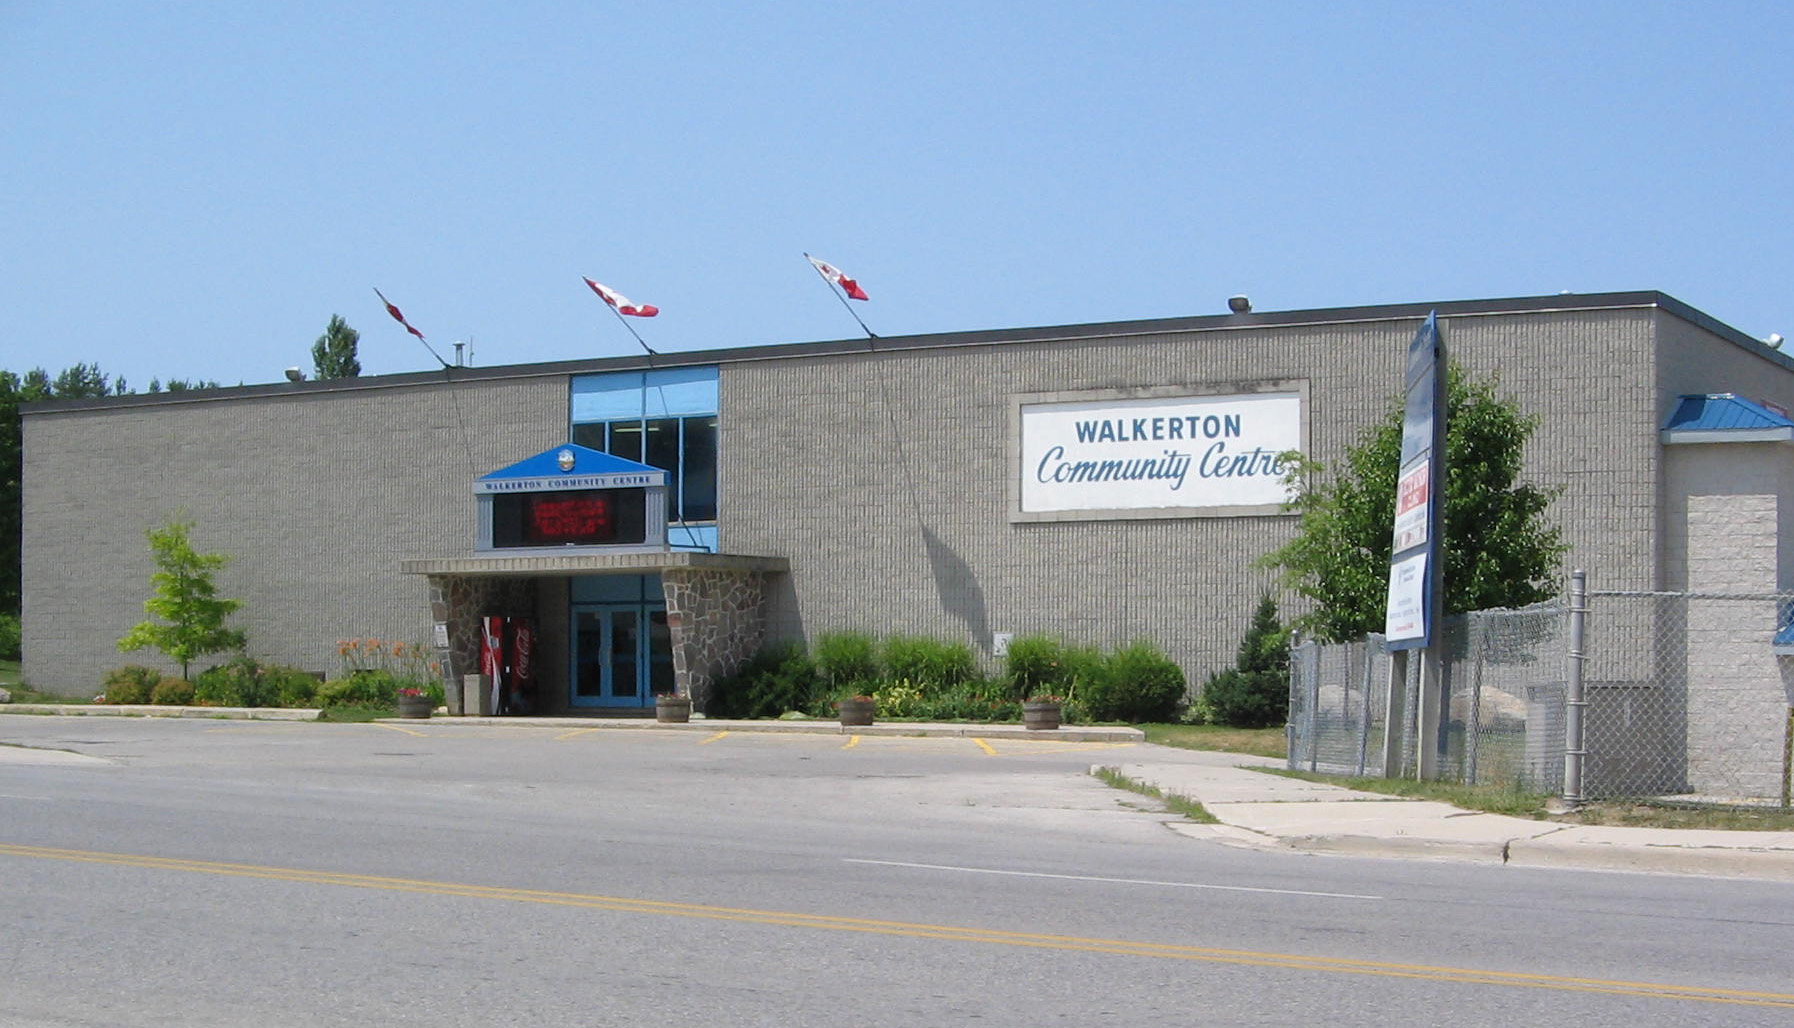 Walkerton Community Centre